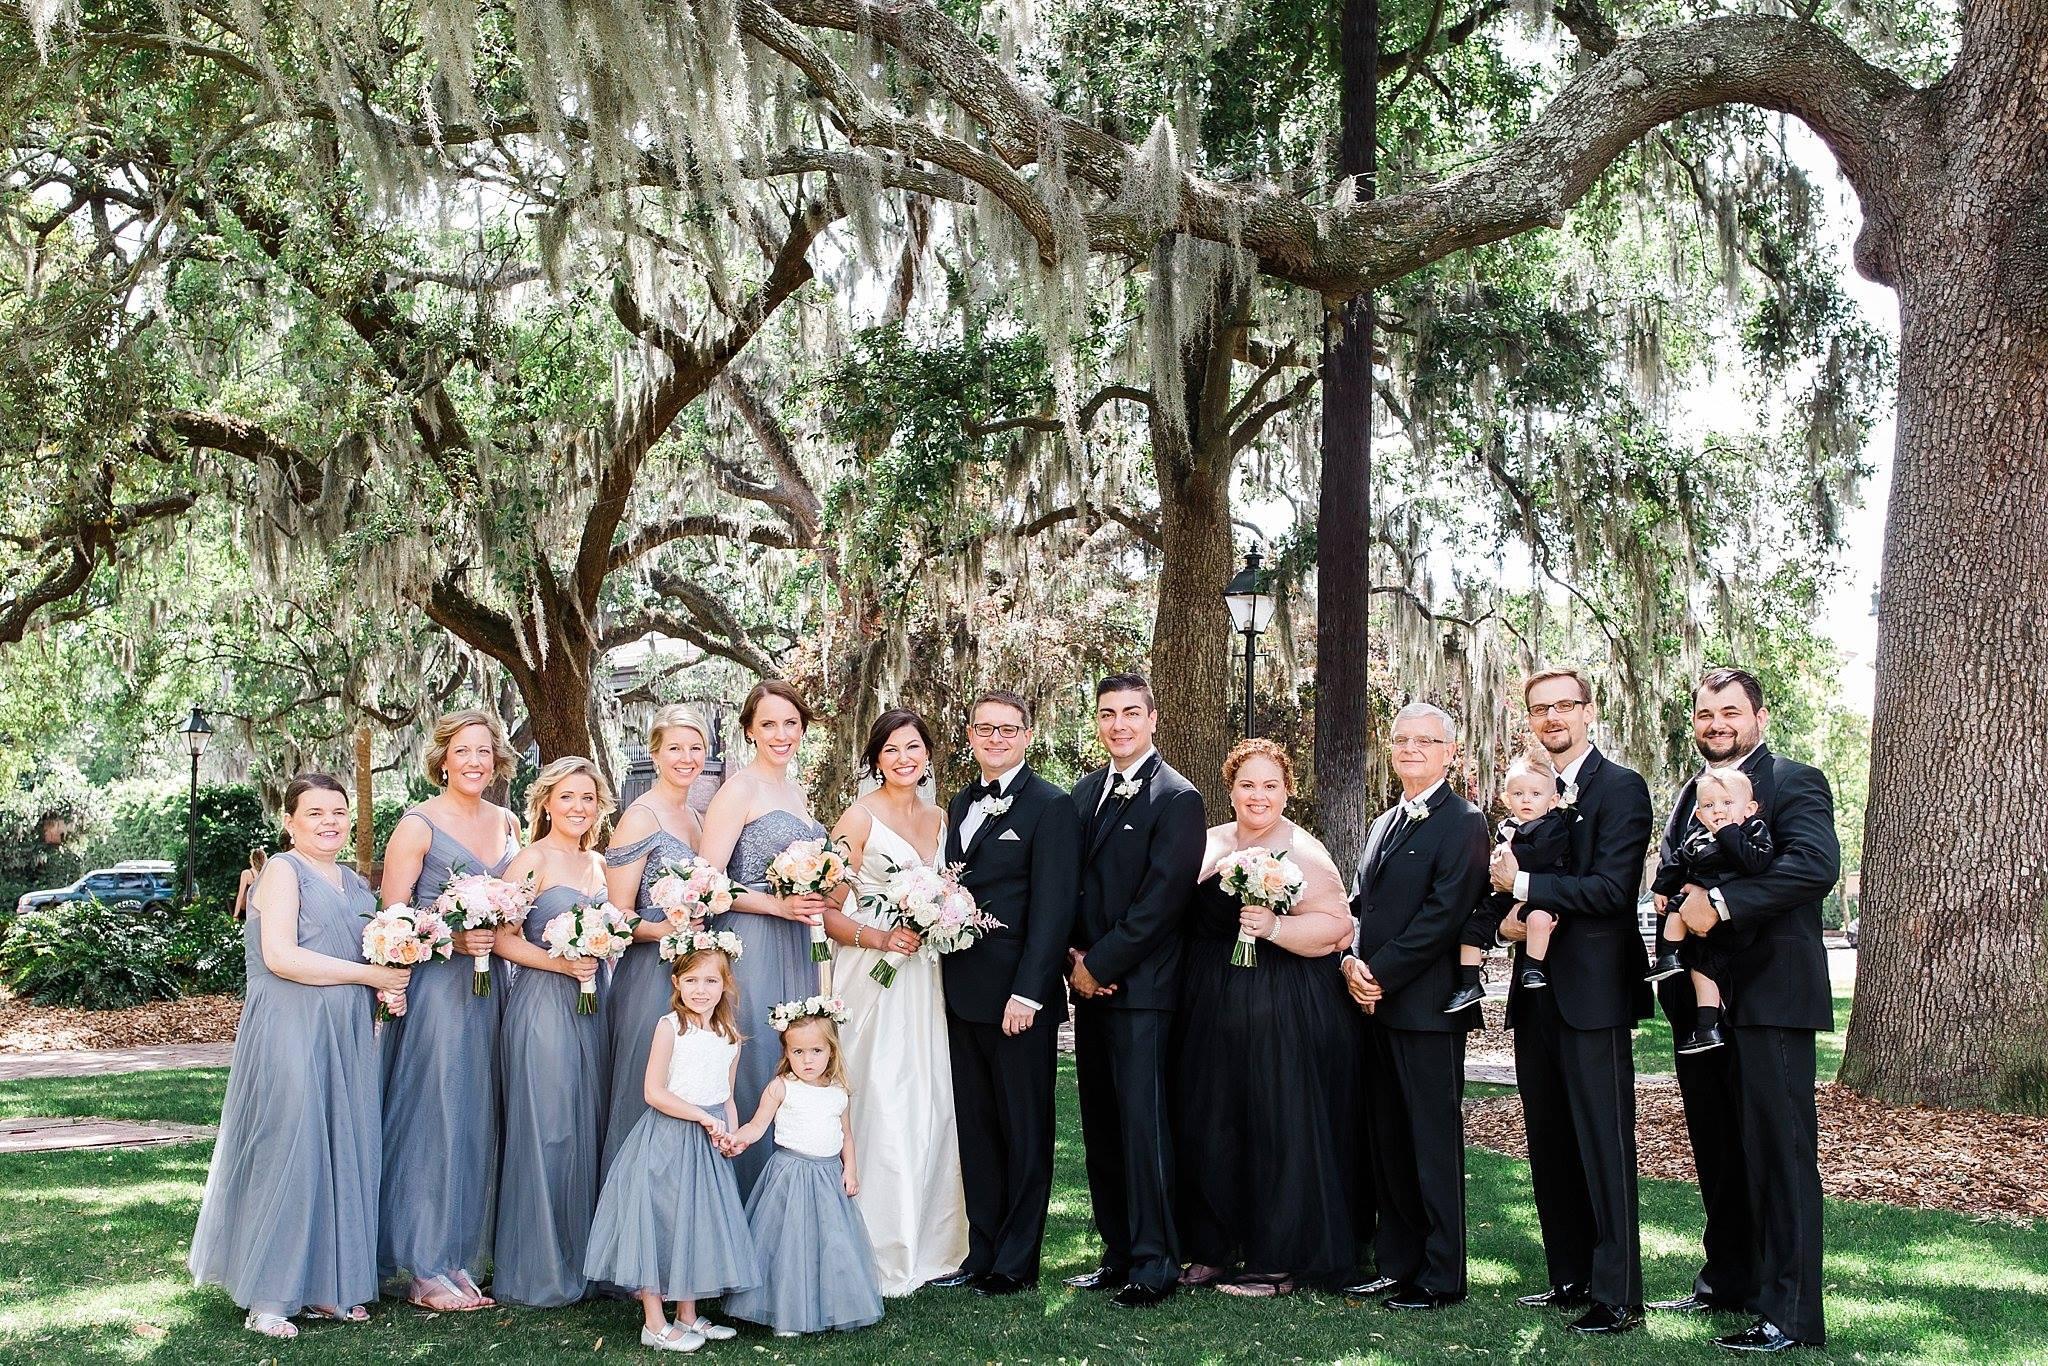 savannah-bridal-shop-ivory-and-beau-bridesmaids-meagans-bride-tribe-jb-marie-photography-jenny-yoo-bridesmaids-savannah-bridesmaids-dresses-savannah-bridesmaids-gowns-4.JPG